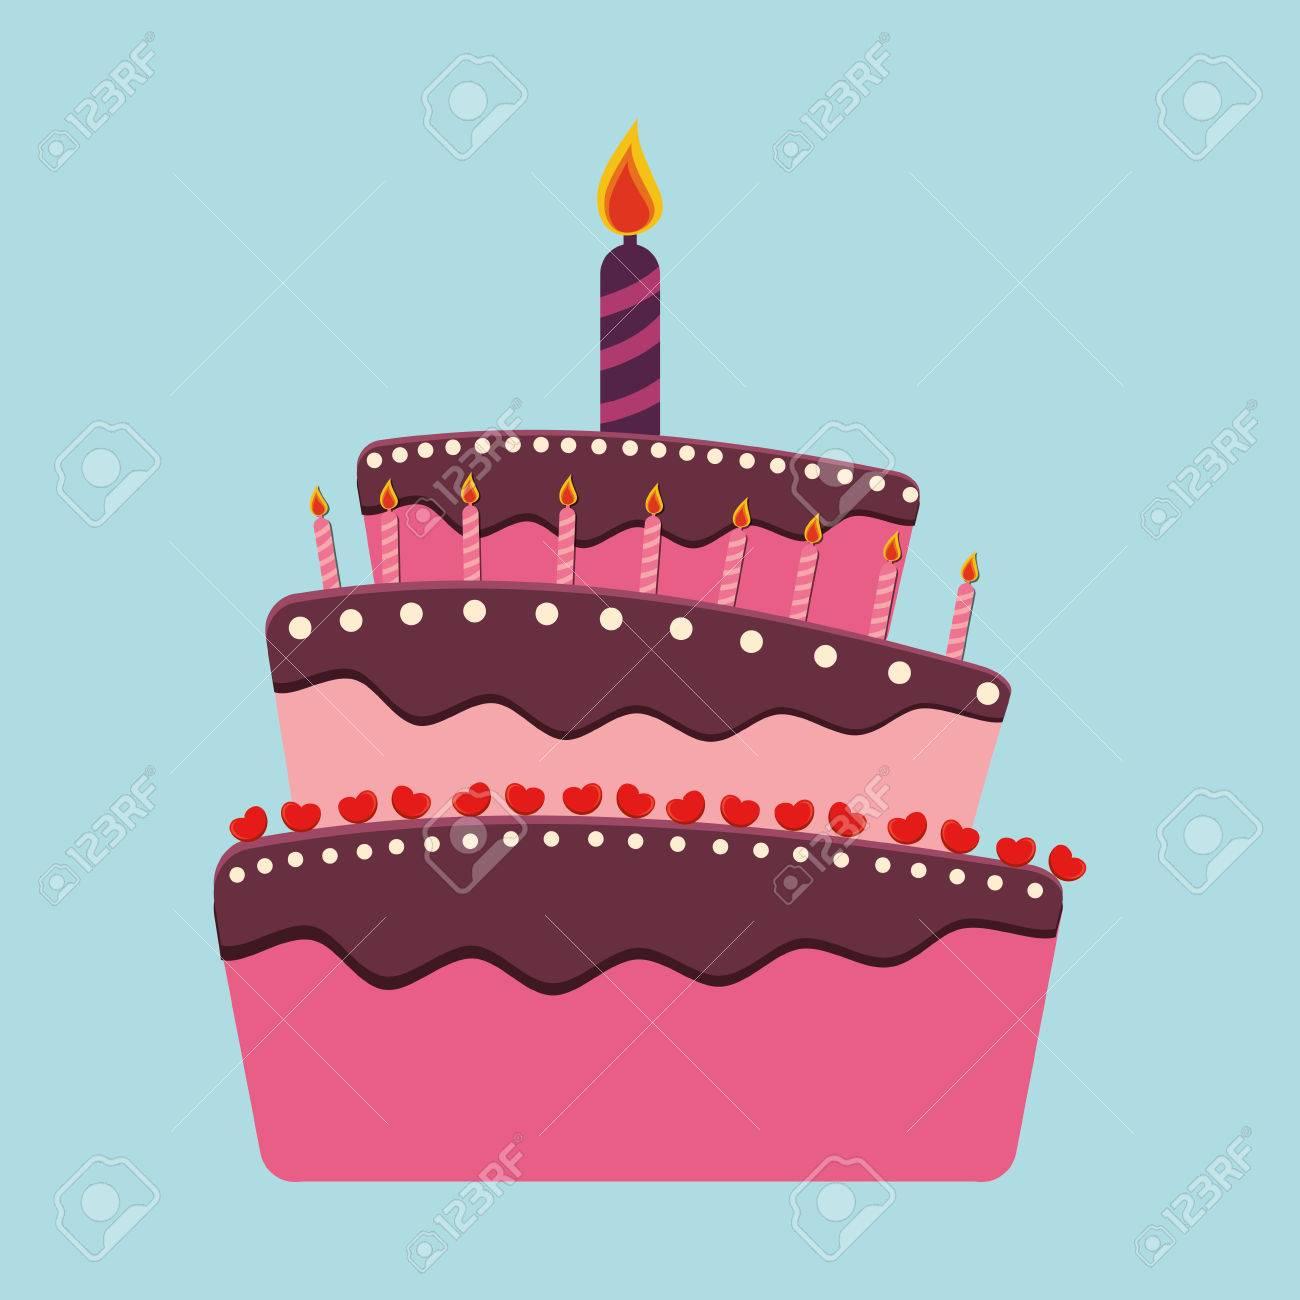 Birthday Cake And Desserts Icon Design Vector Illustration Stock